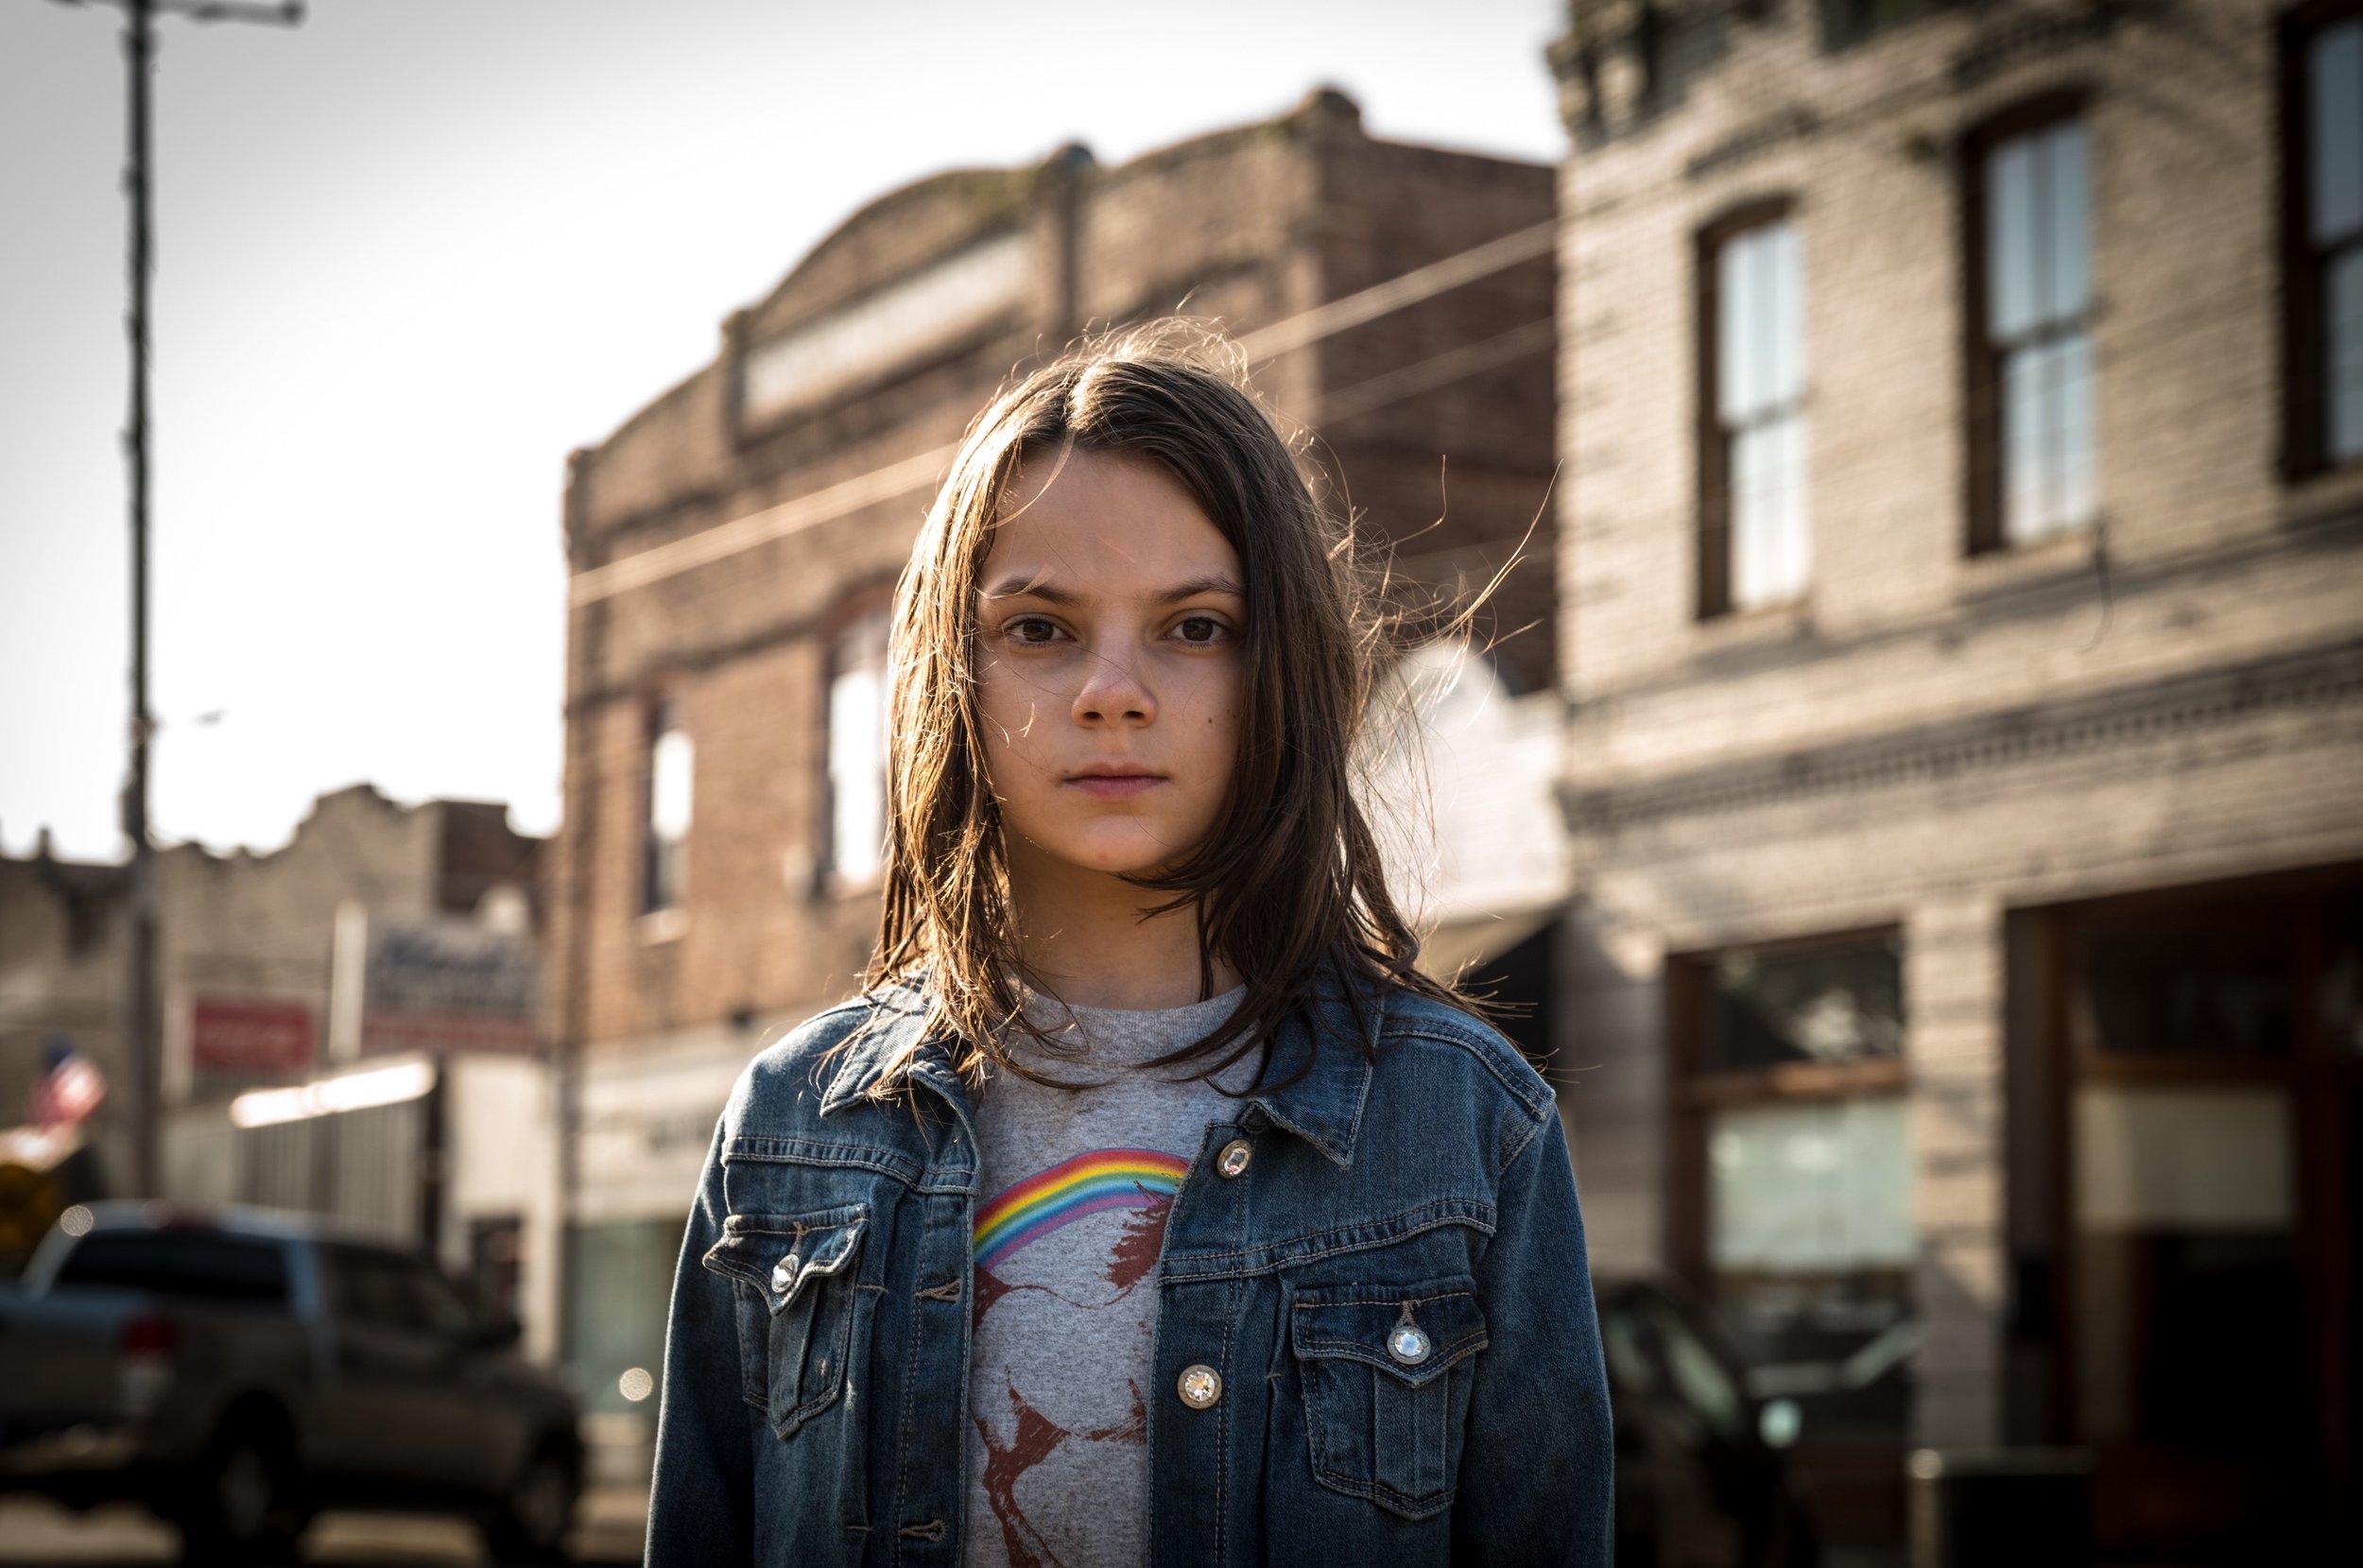 Newcomer Dafne Keen is a scene-stealer